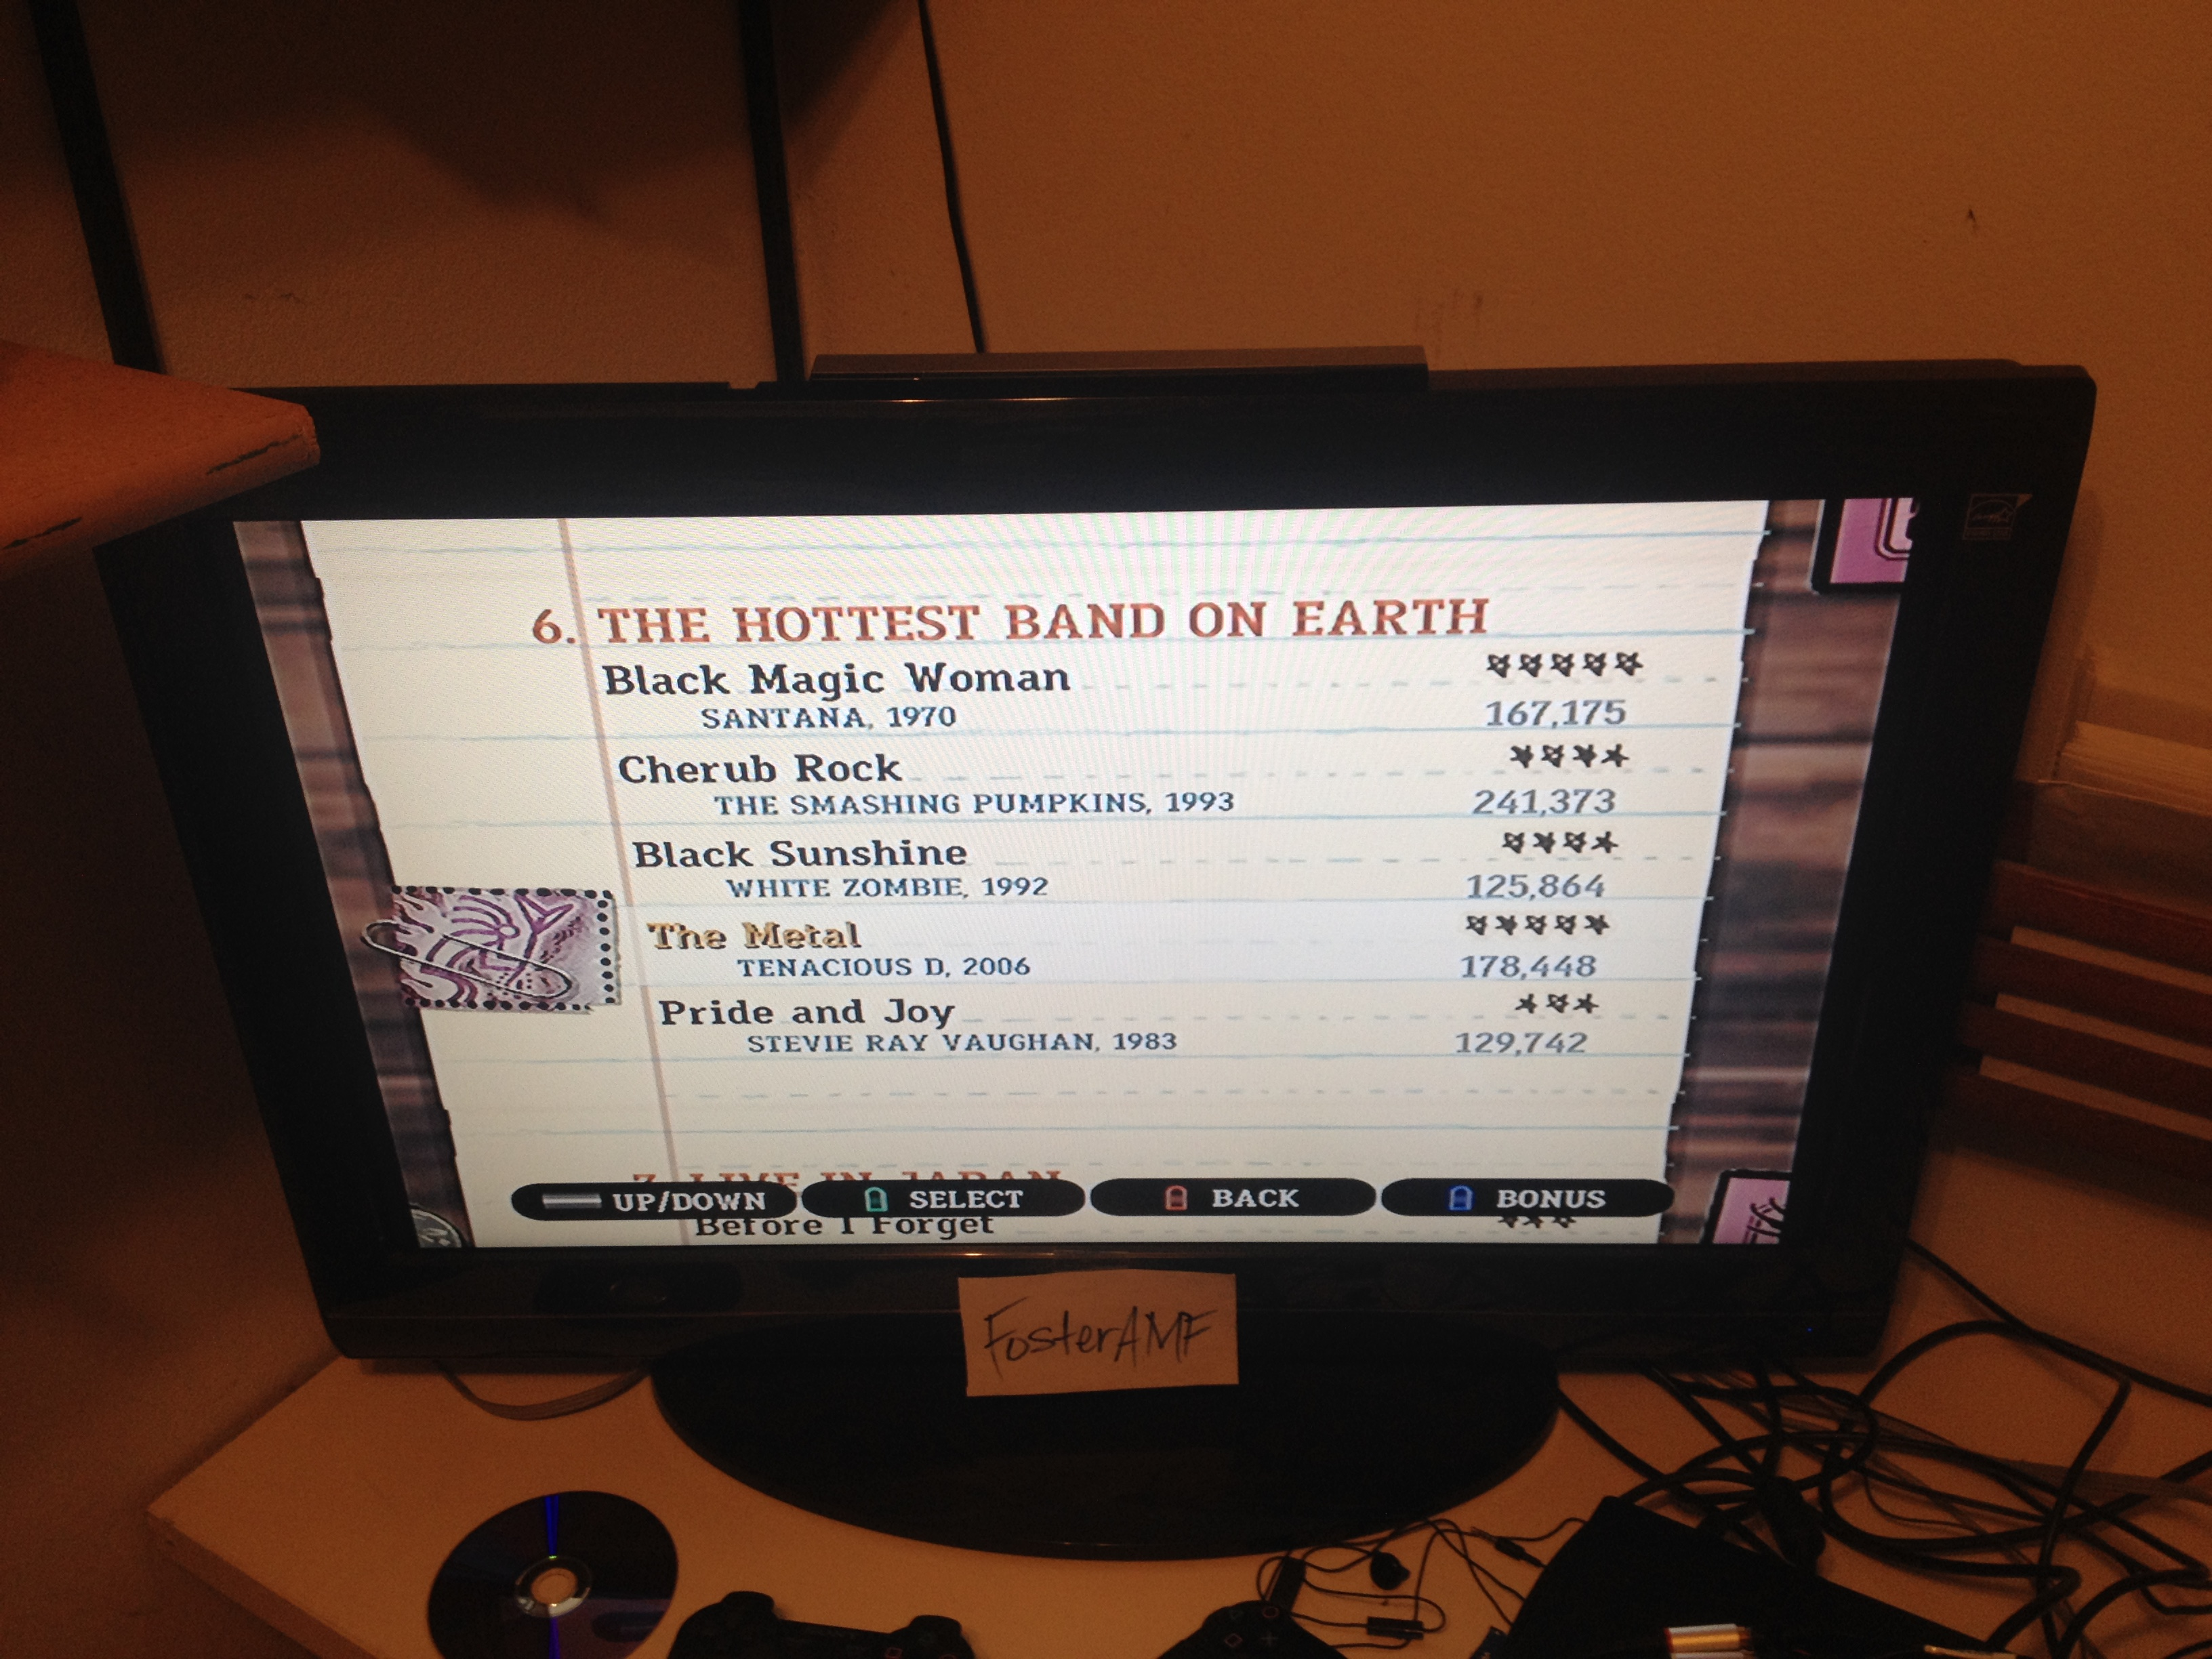 "FosterAMF: Guitar Hero III: Legends of Rock: ""The Metal"" [Expert] (Wii) 178,448 points on 2015-04-19 01:02:56"